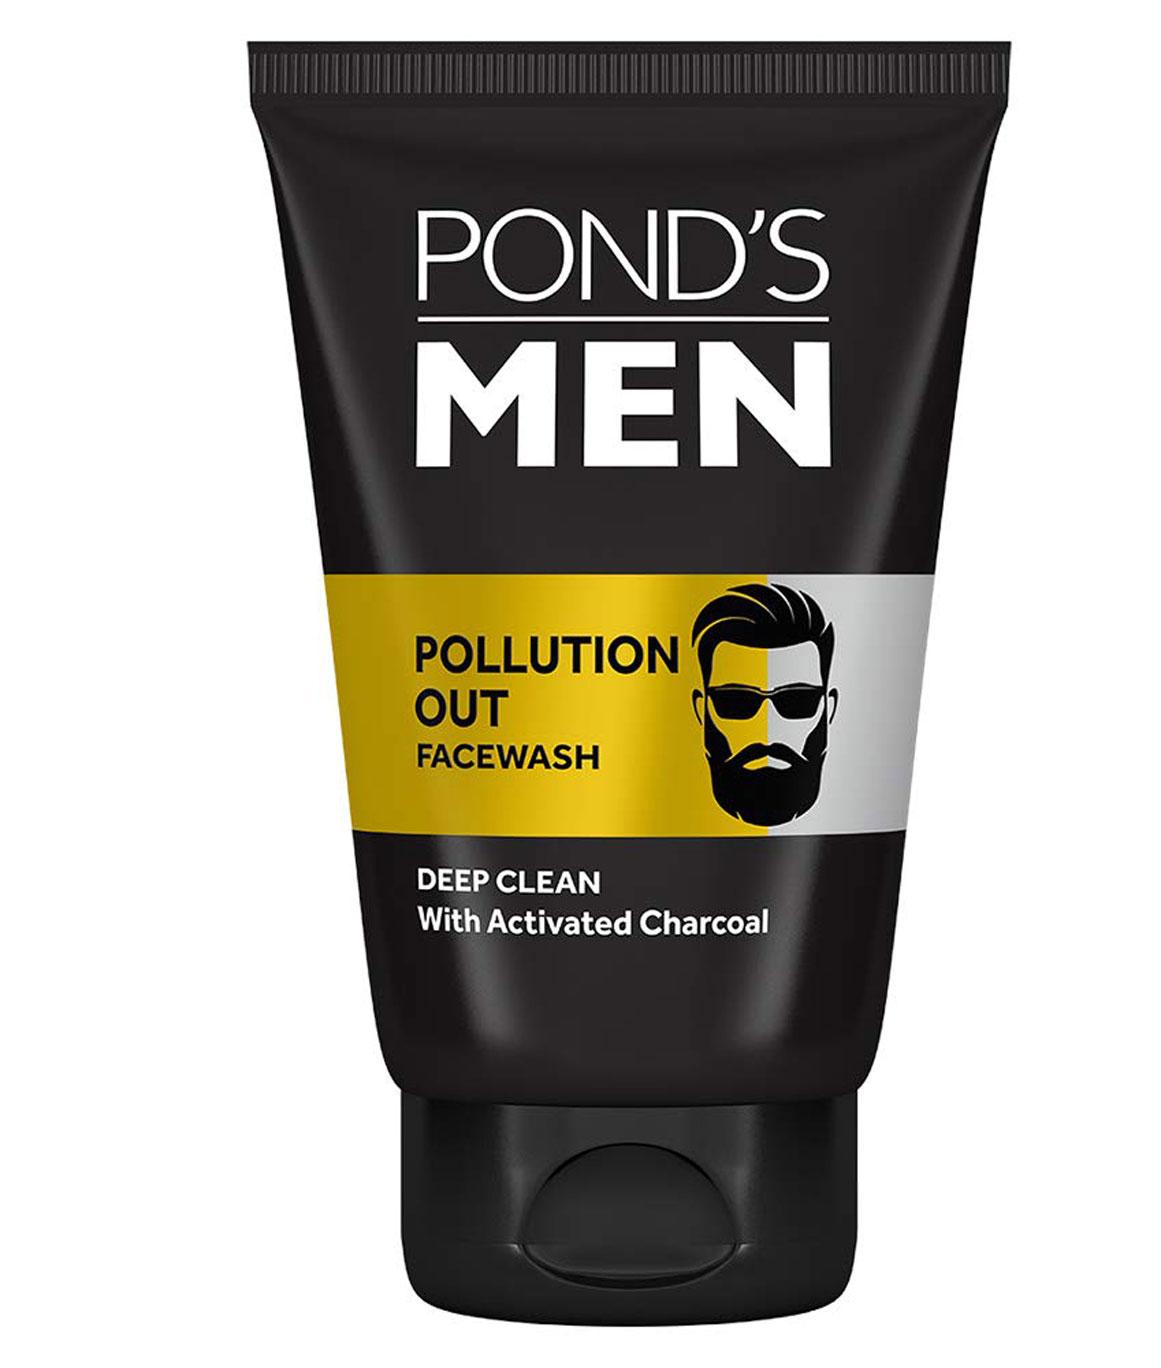 Ponds Men Pollution Out Activated Charcoal Deep Clean Facewash 100 g